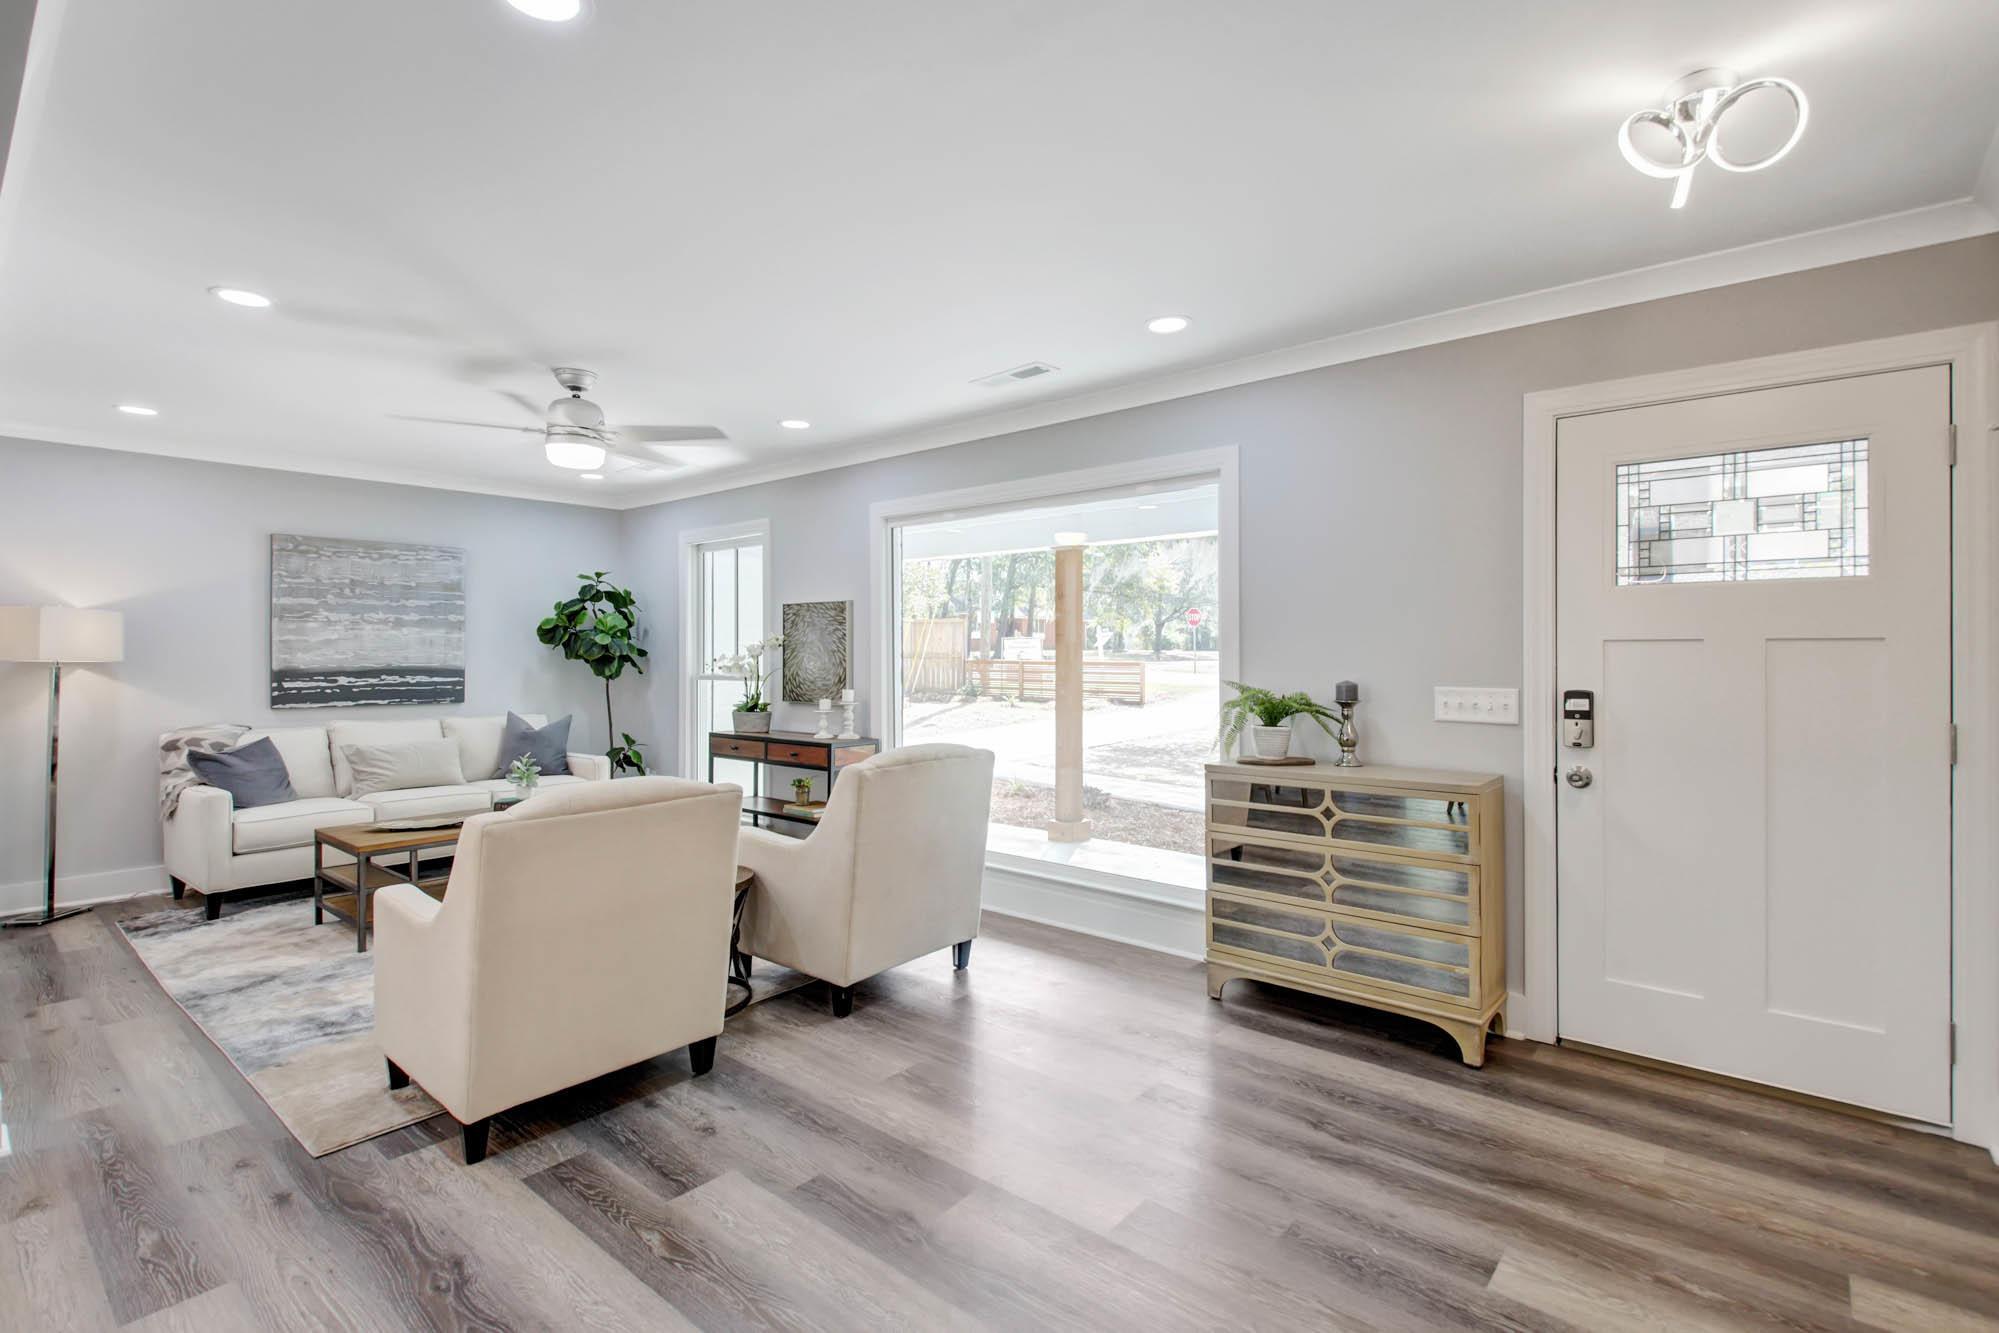 Scanlonville Homes For Sale - 344 4th, Mount Pleasant, SC - 16